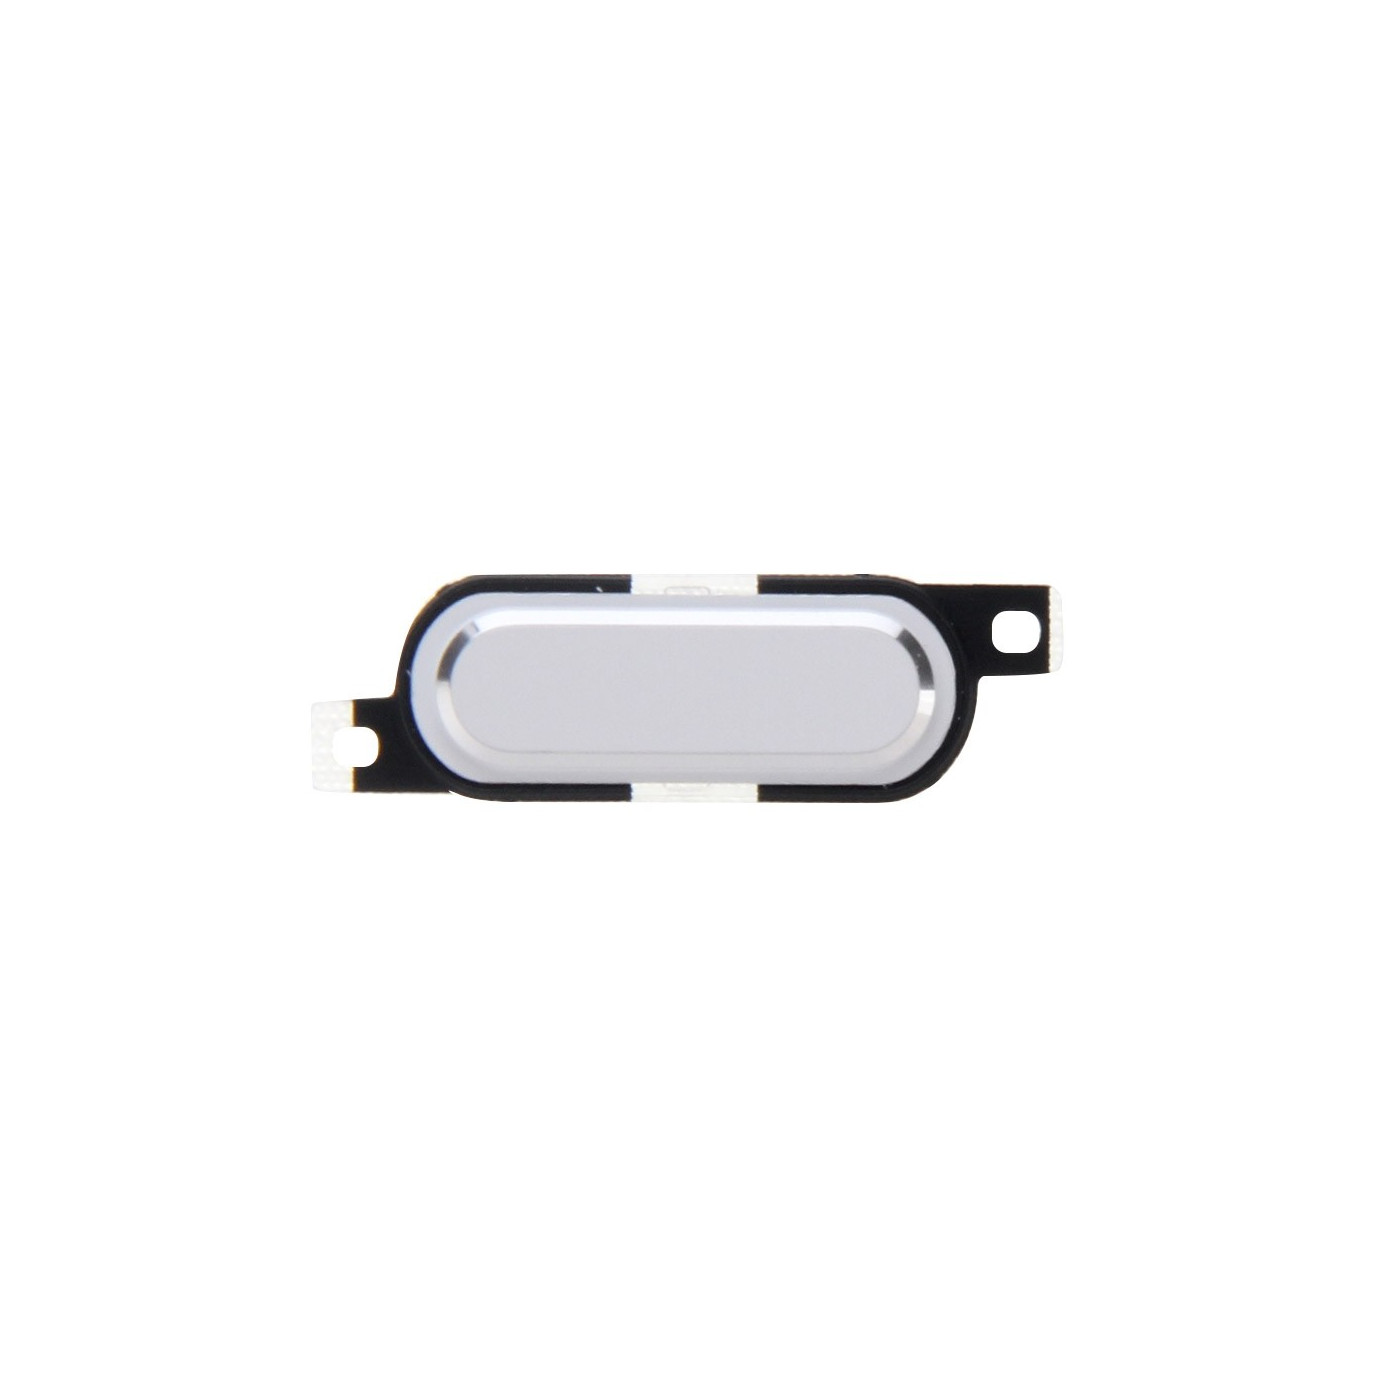 Pulsante centrale home menu bianco per Samsung Galaxy Note 3 Neo N7505